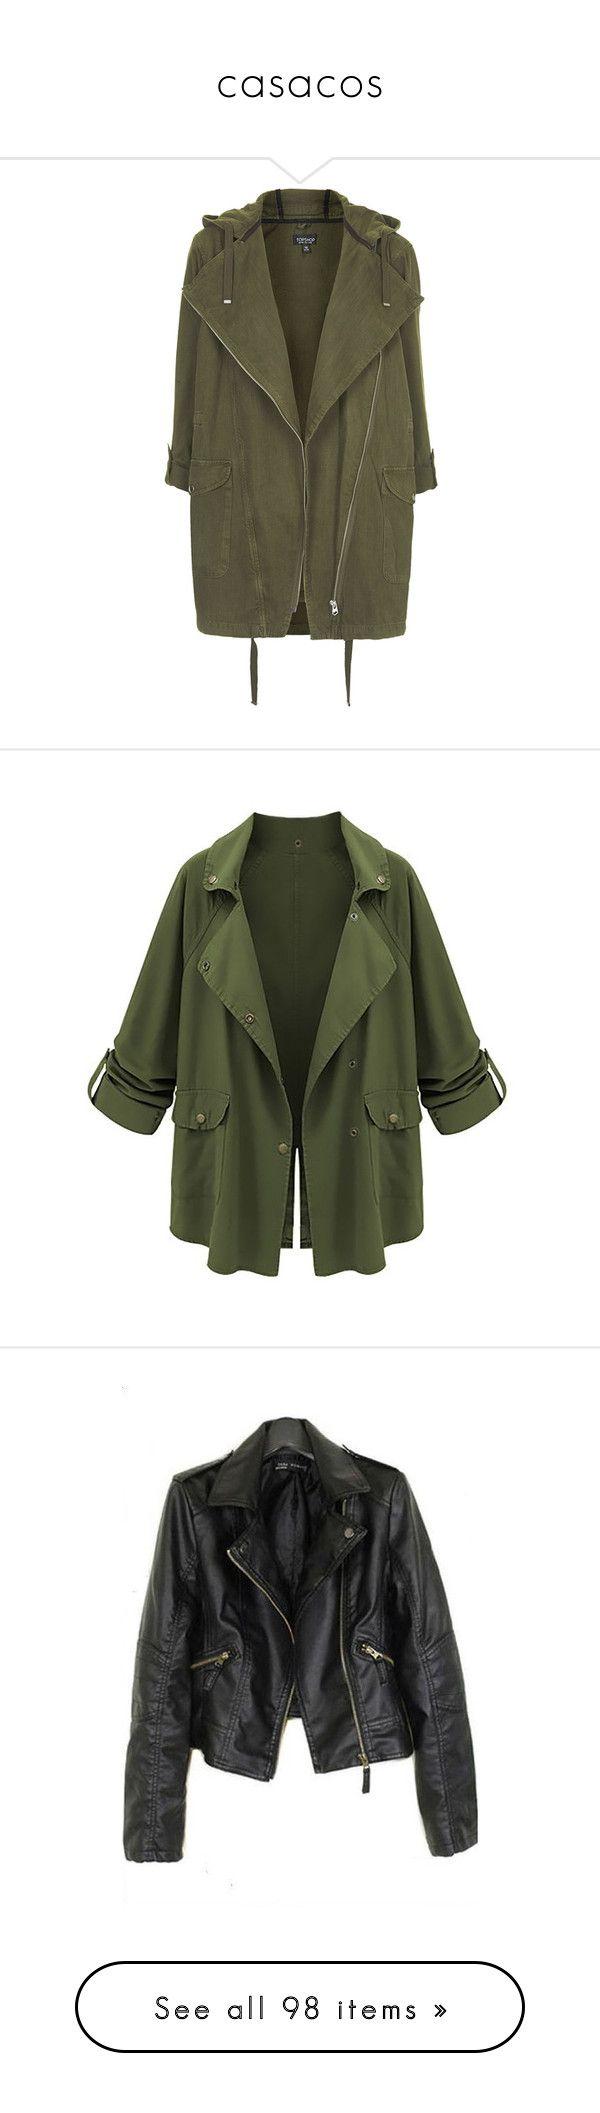 """casacos"" by dani-gracik on Polyvore featuring outerwear, jackets, coats, coats & jackets, khaki, topshop parka, cotton parka, khaki parka, tops e green"